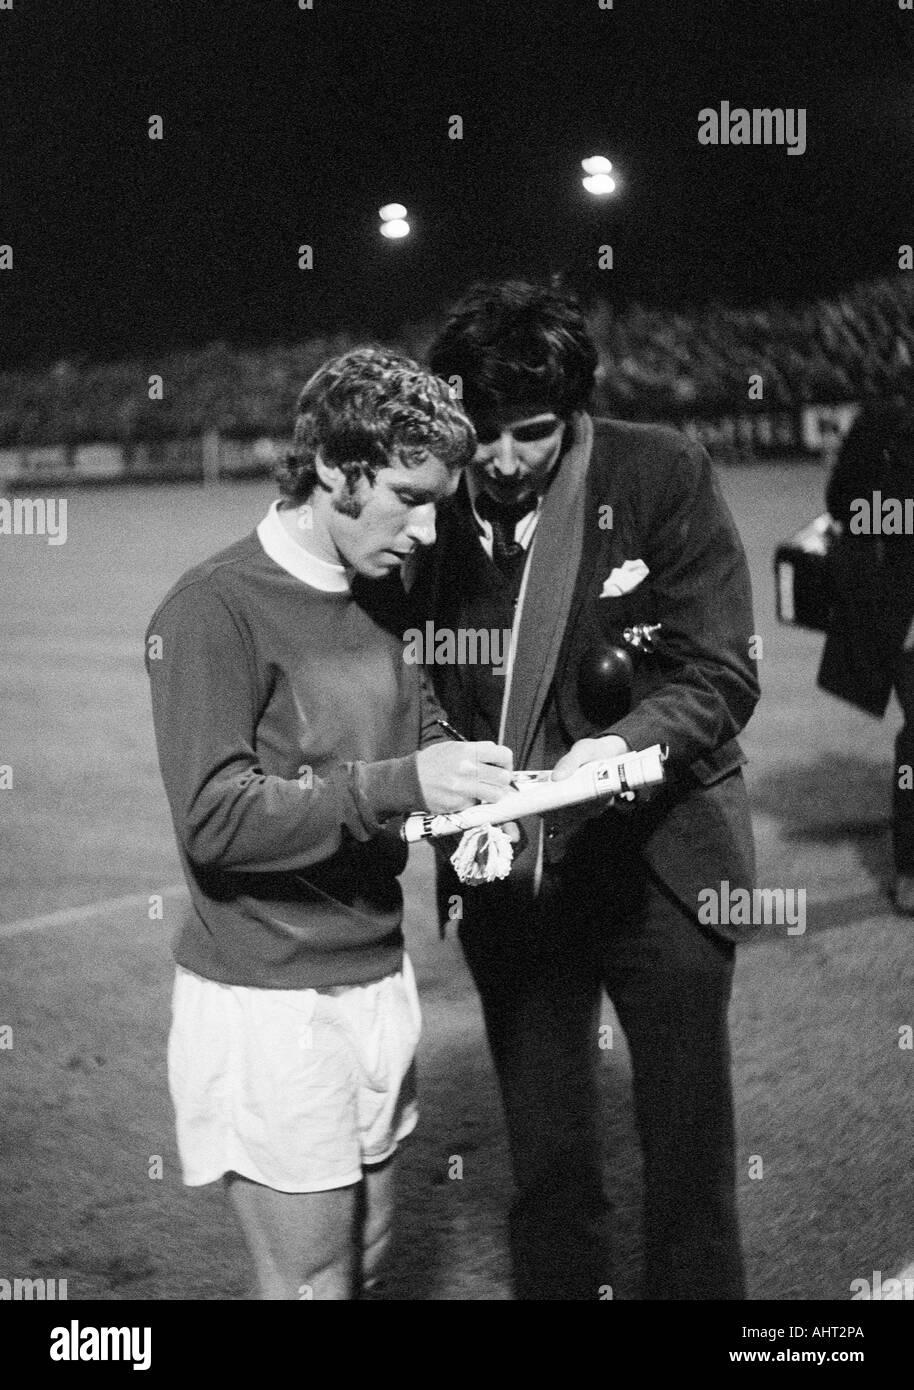 football, European Cup, eighth final, first leg, 1970/1971, Boekelberg Stadium in Moenchengladbach, Borussia Moenchengladbach versus FC Everton 1:1, football player, Alan Ball (Everton) gives an autograph to a football fan - Stock Image